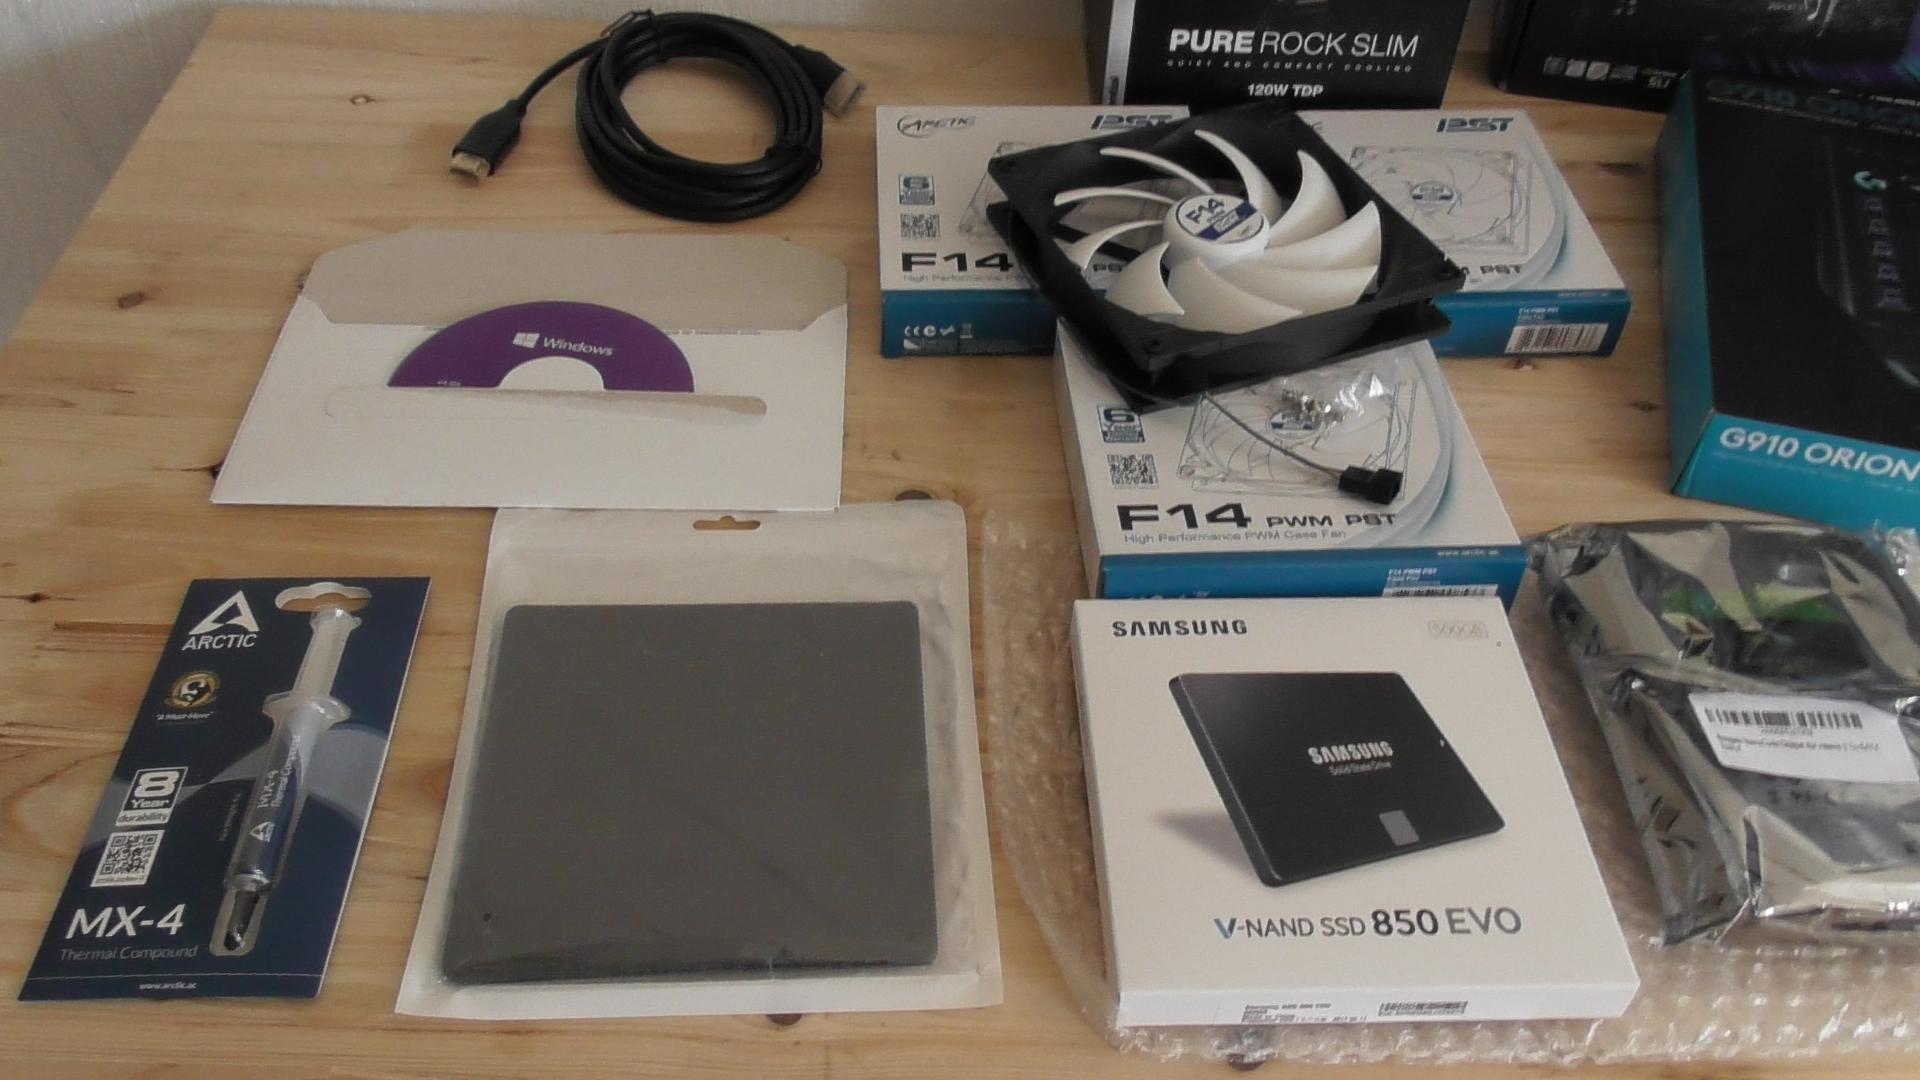 Staubfilter, SSD Festplatte, Betriebssystem